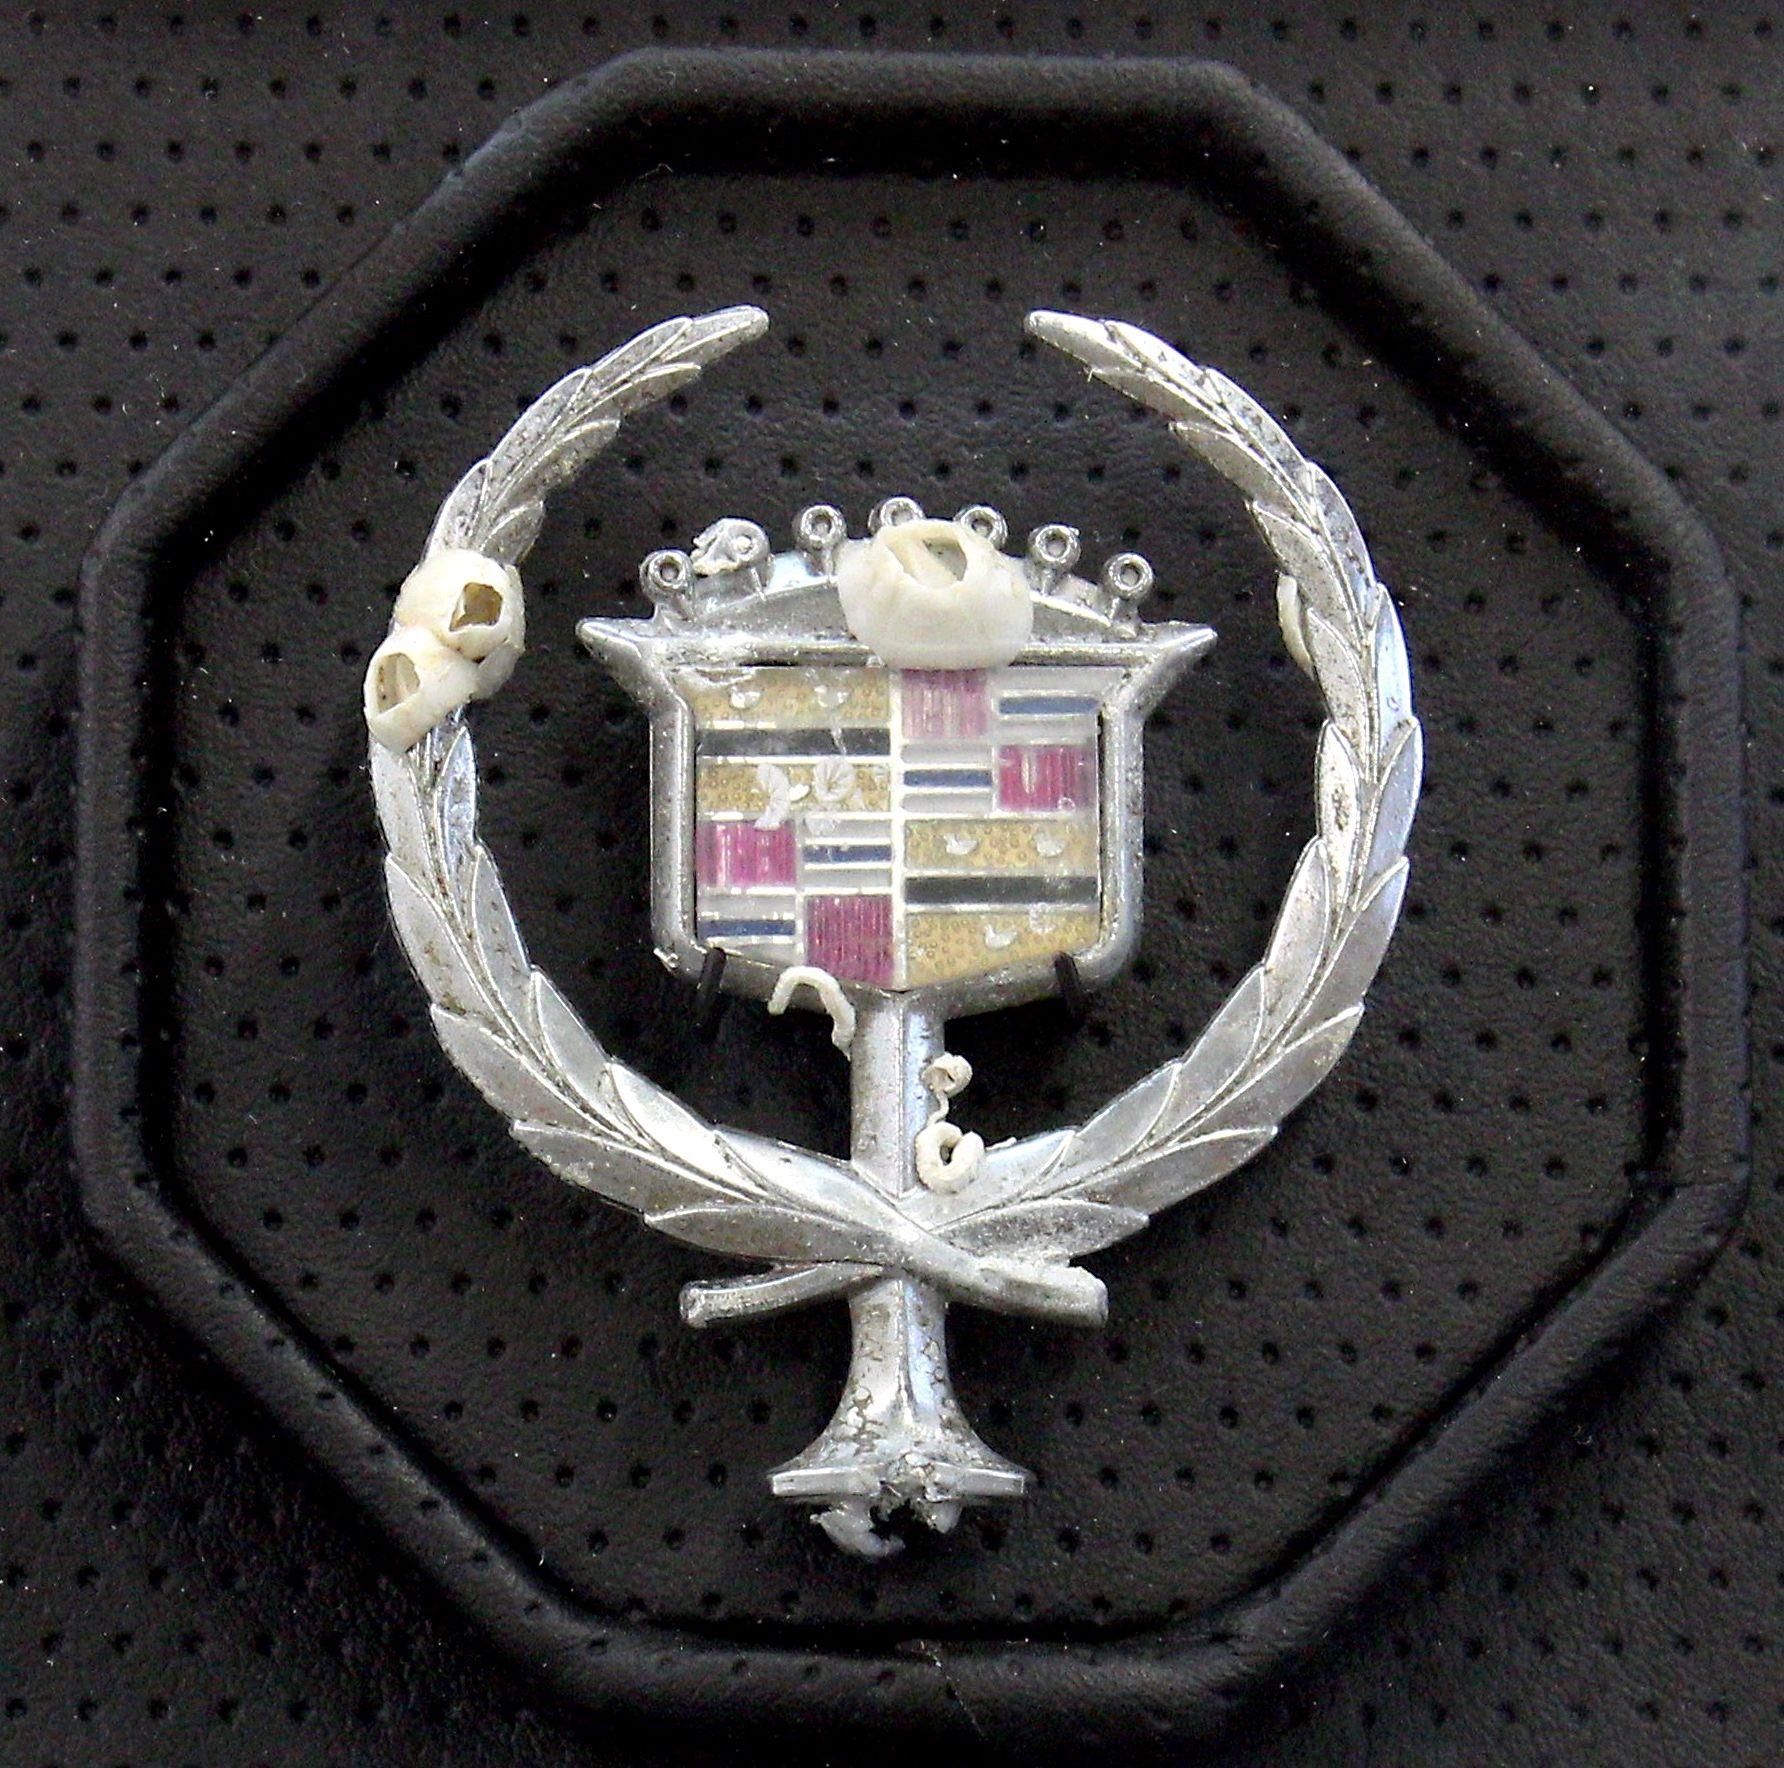 Benjamin Kelley Untitled 07, 2019 Vinyl, acrylic, valcromat, barnacle encrusted Cadillac emblem 6.25 x 6.25 x 6 inches